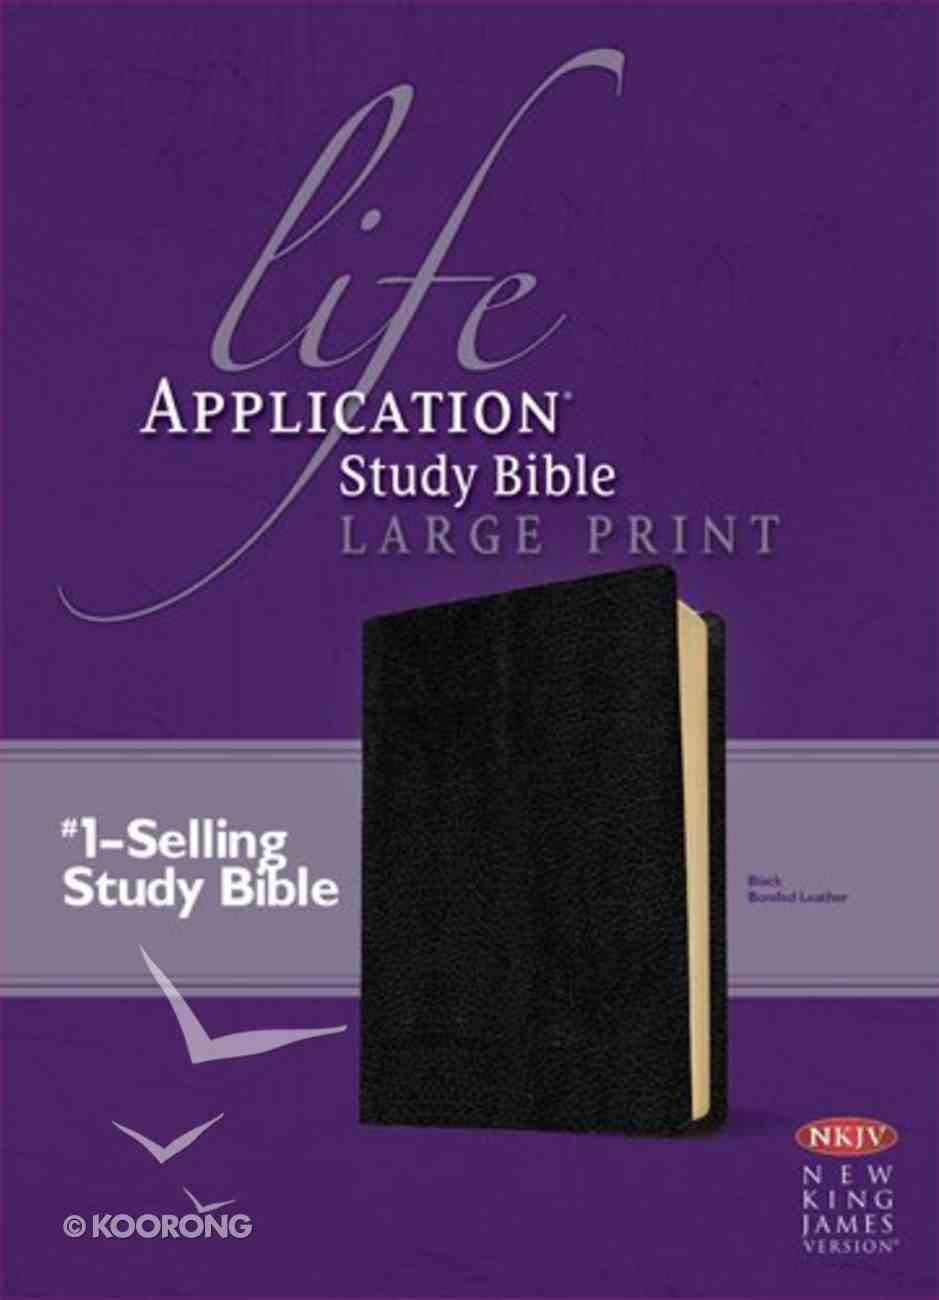 NKJV Life Application Study Bible Large Print Black 2nd Edition (Red Letter Edition) Bonded Leather